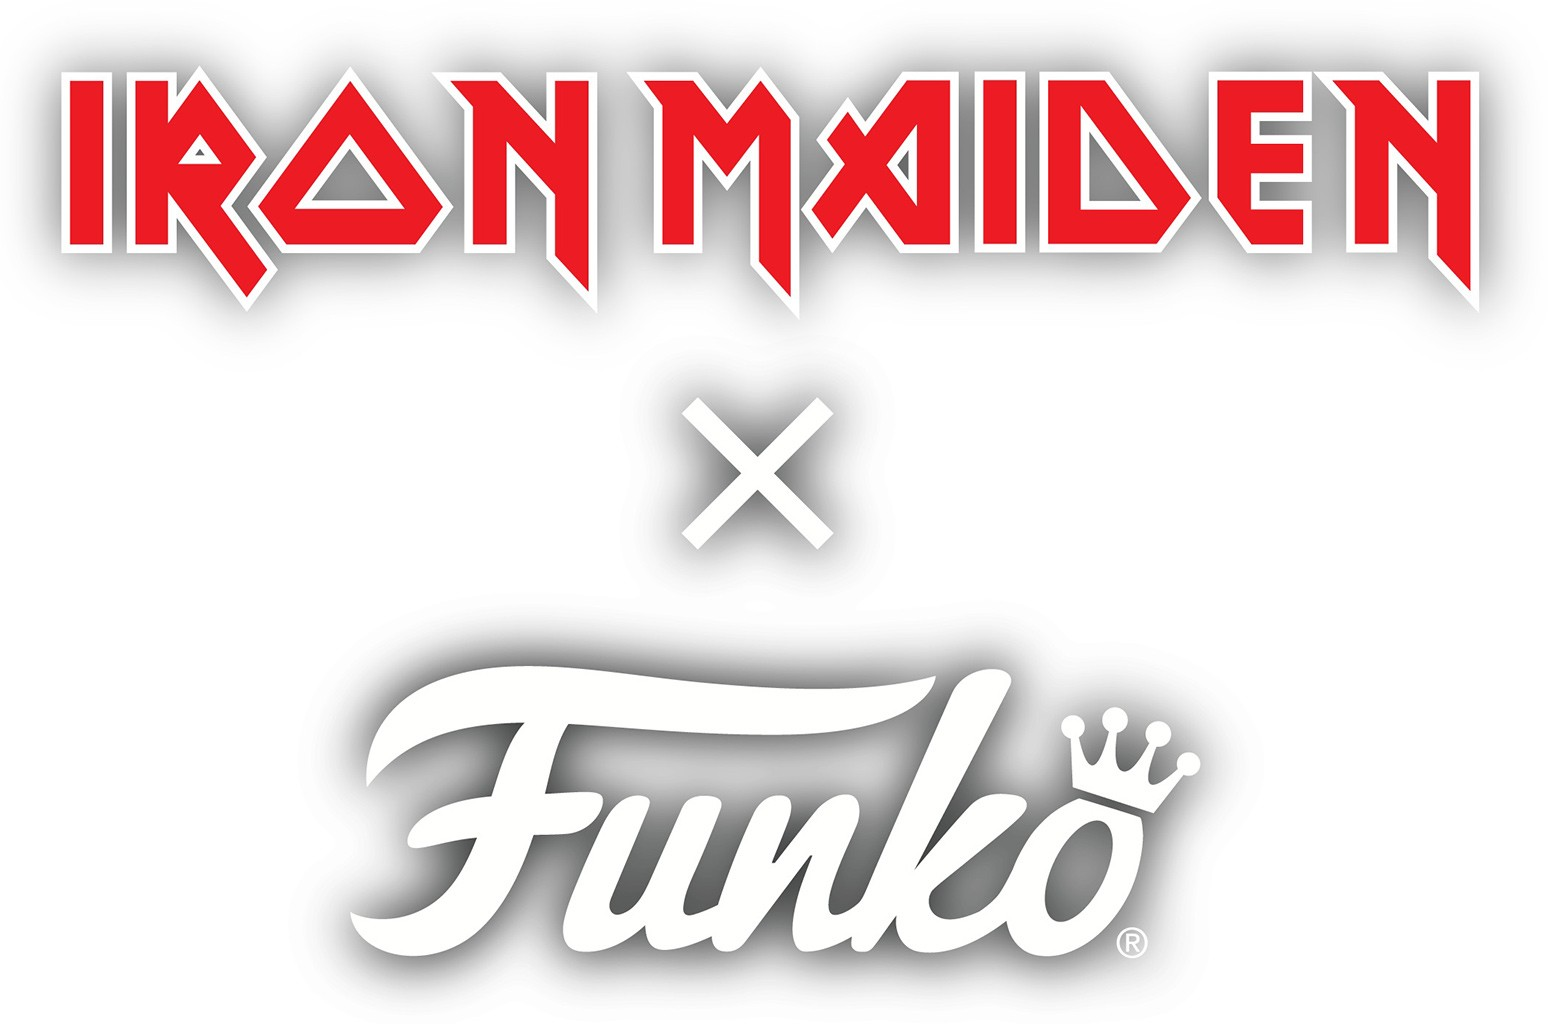 Iron Maiden and Funko